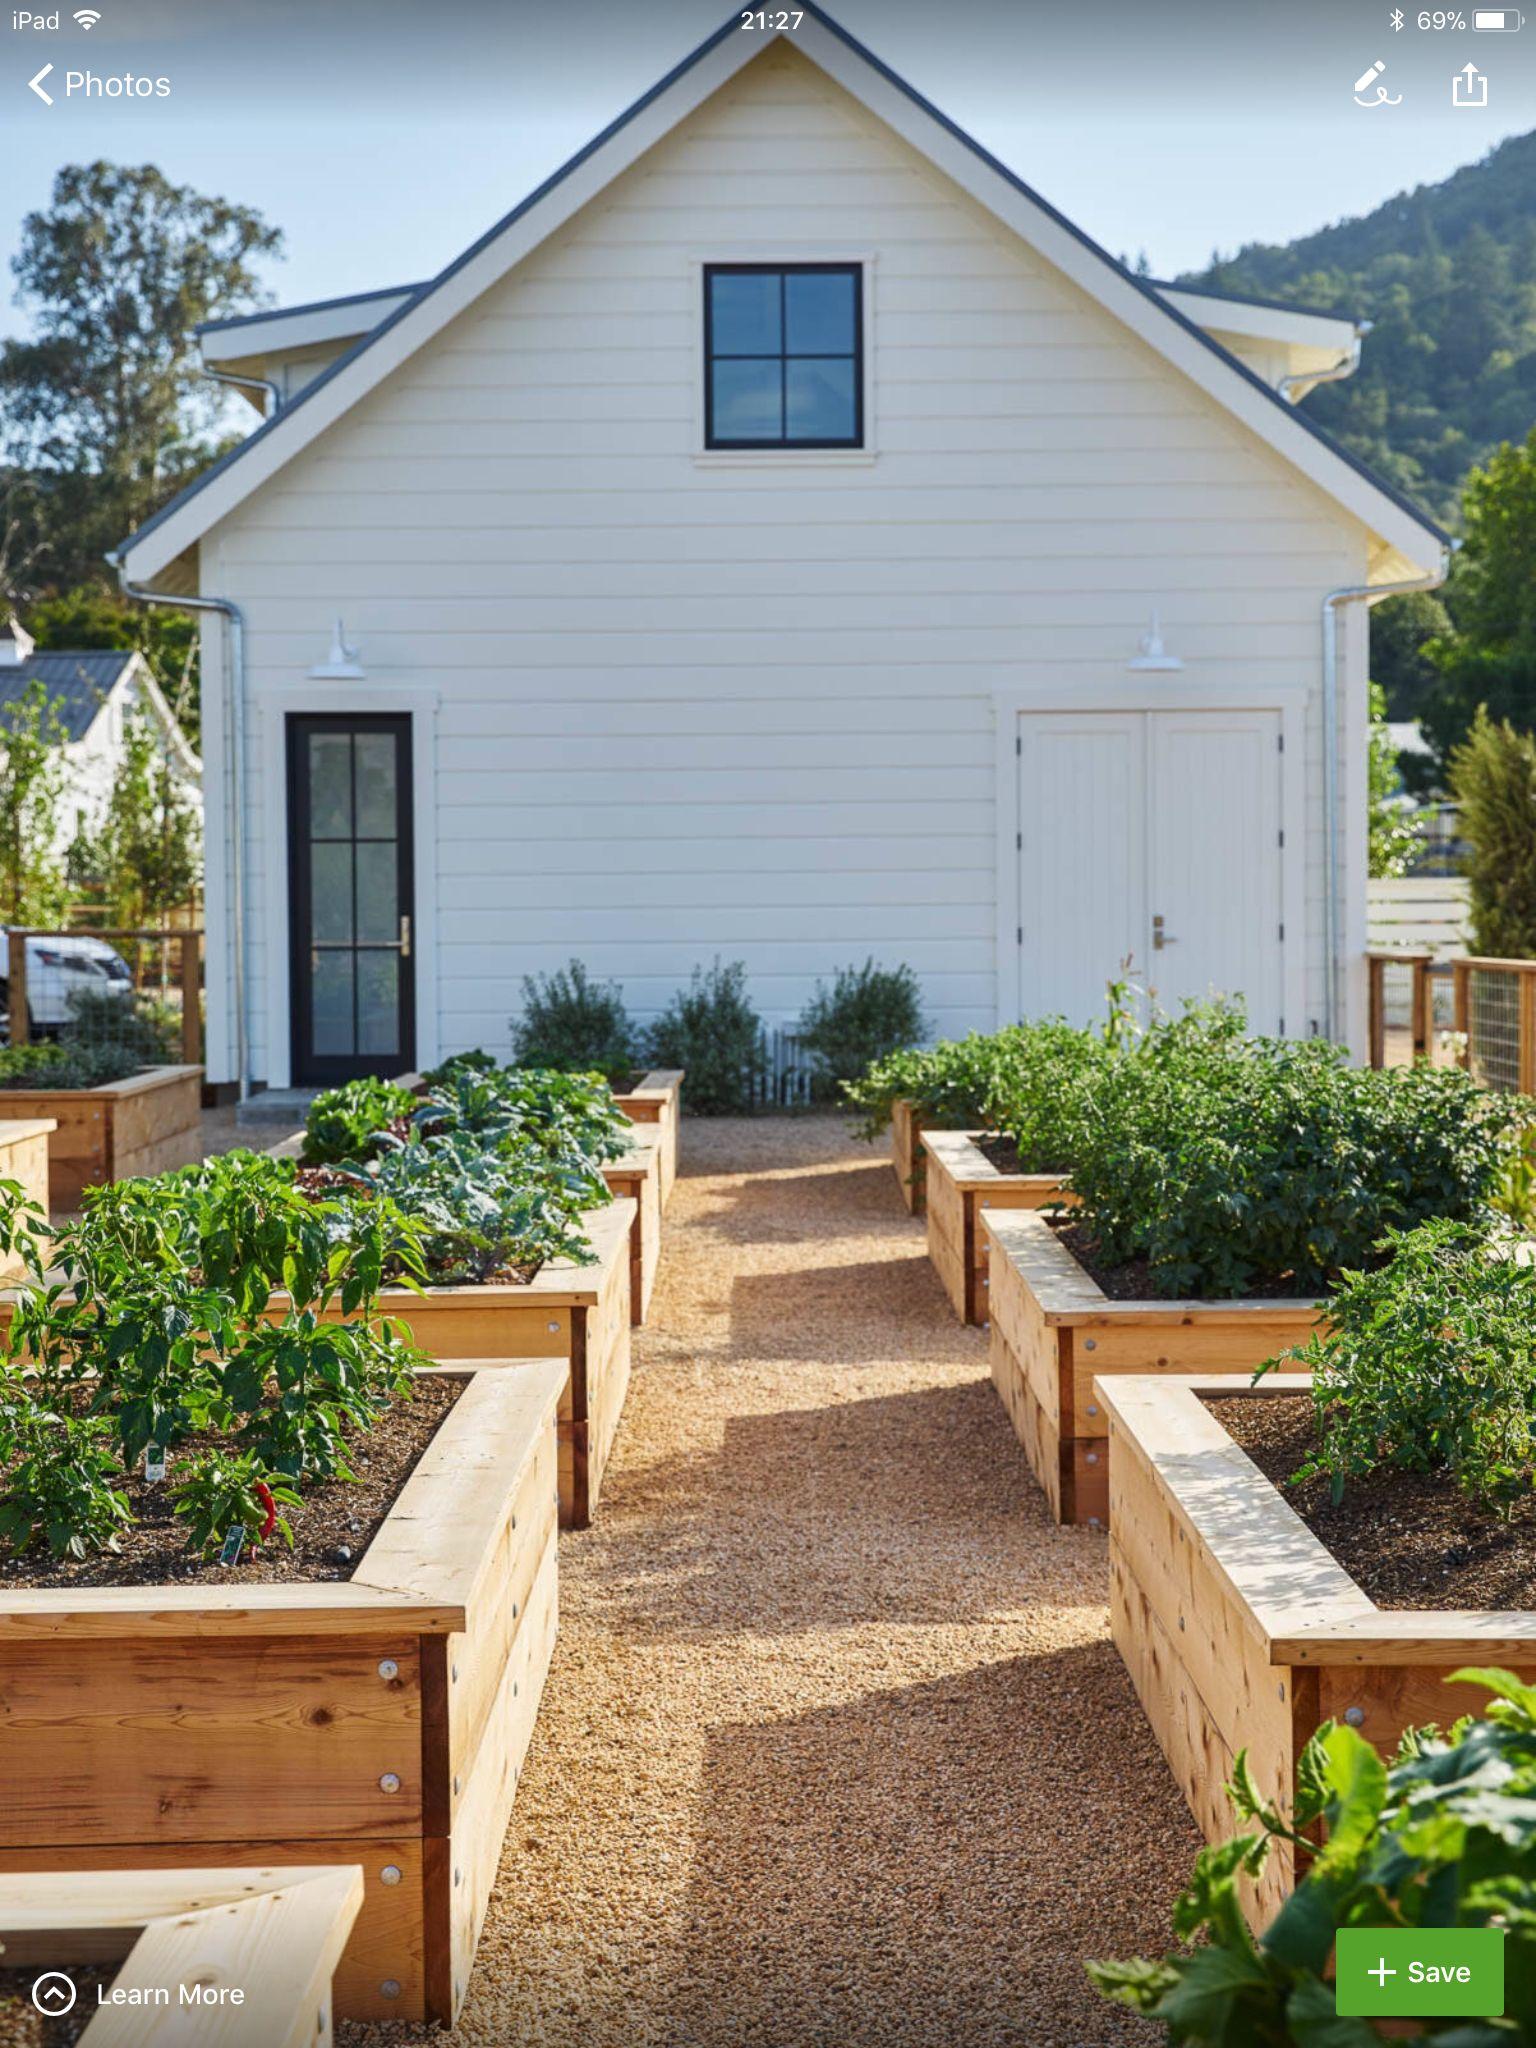 kitchen garden, raised beds, wooden beds, garden path, gravel, pea ...